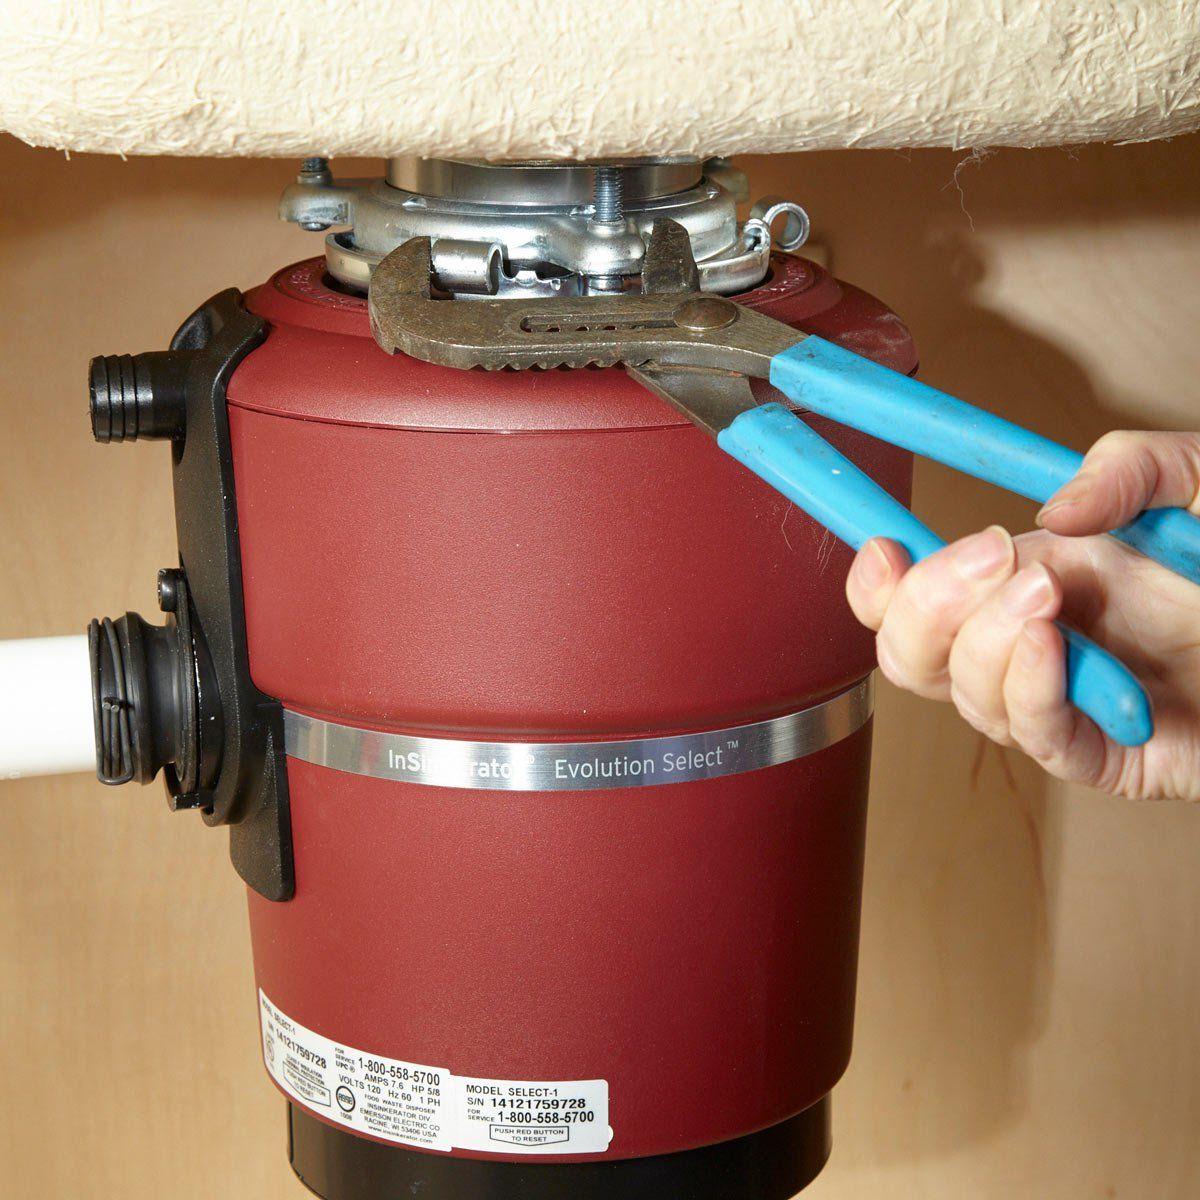 How to Replace a Garbage Disposal Garbage disposal